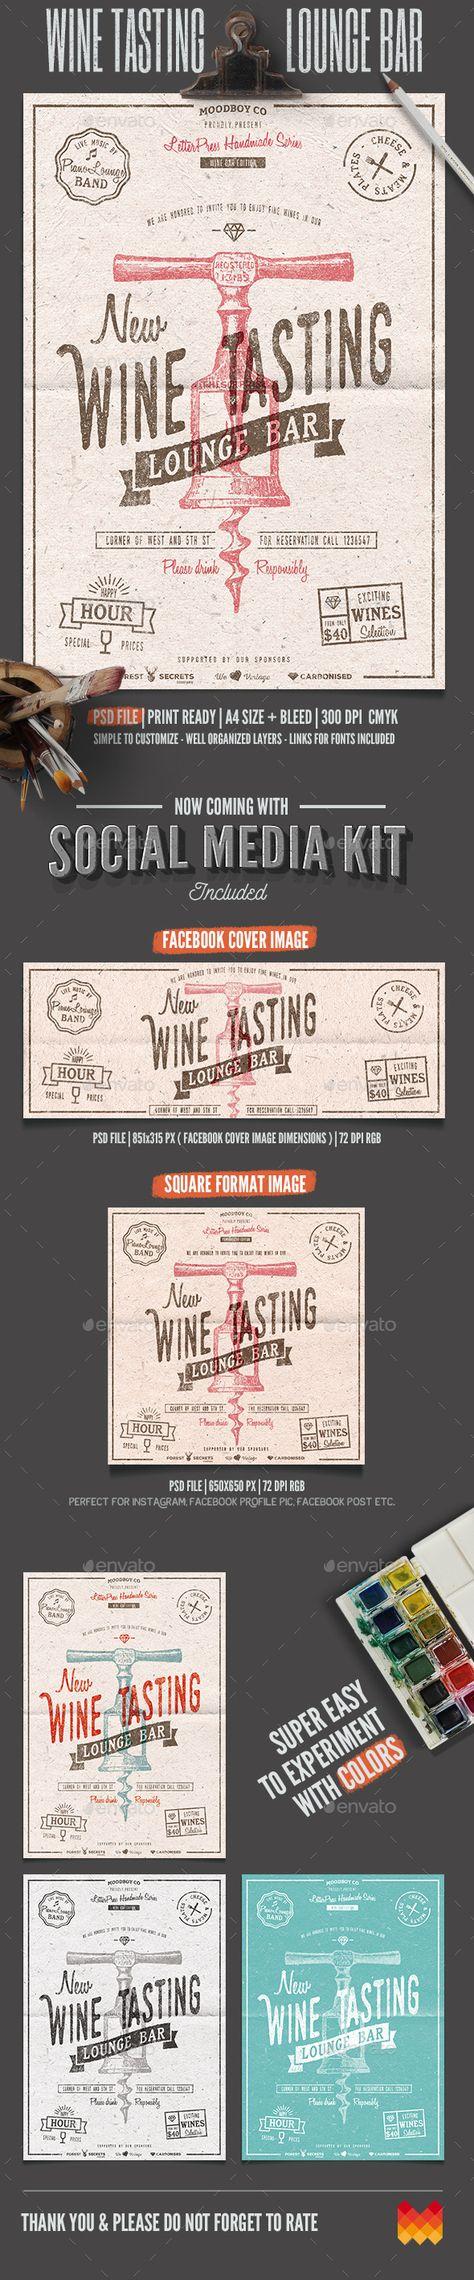 Wine Tasting Lounge Flyer/Poster